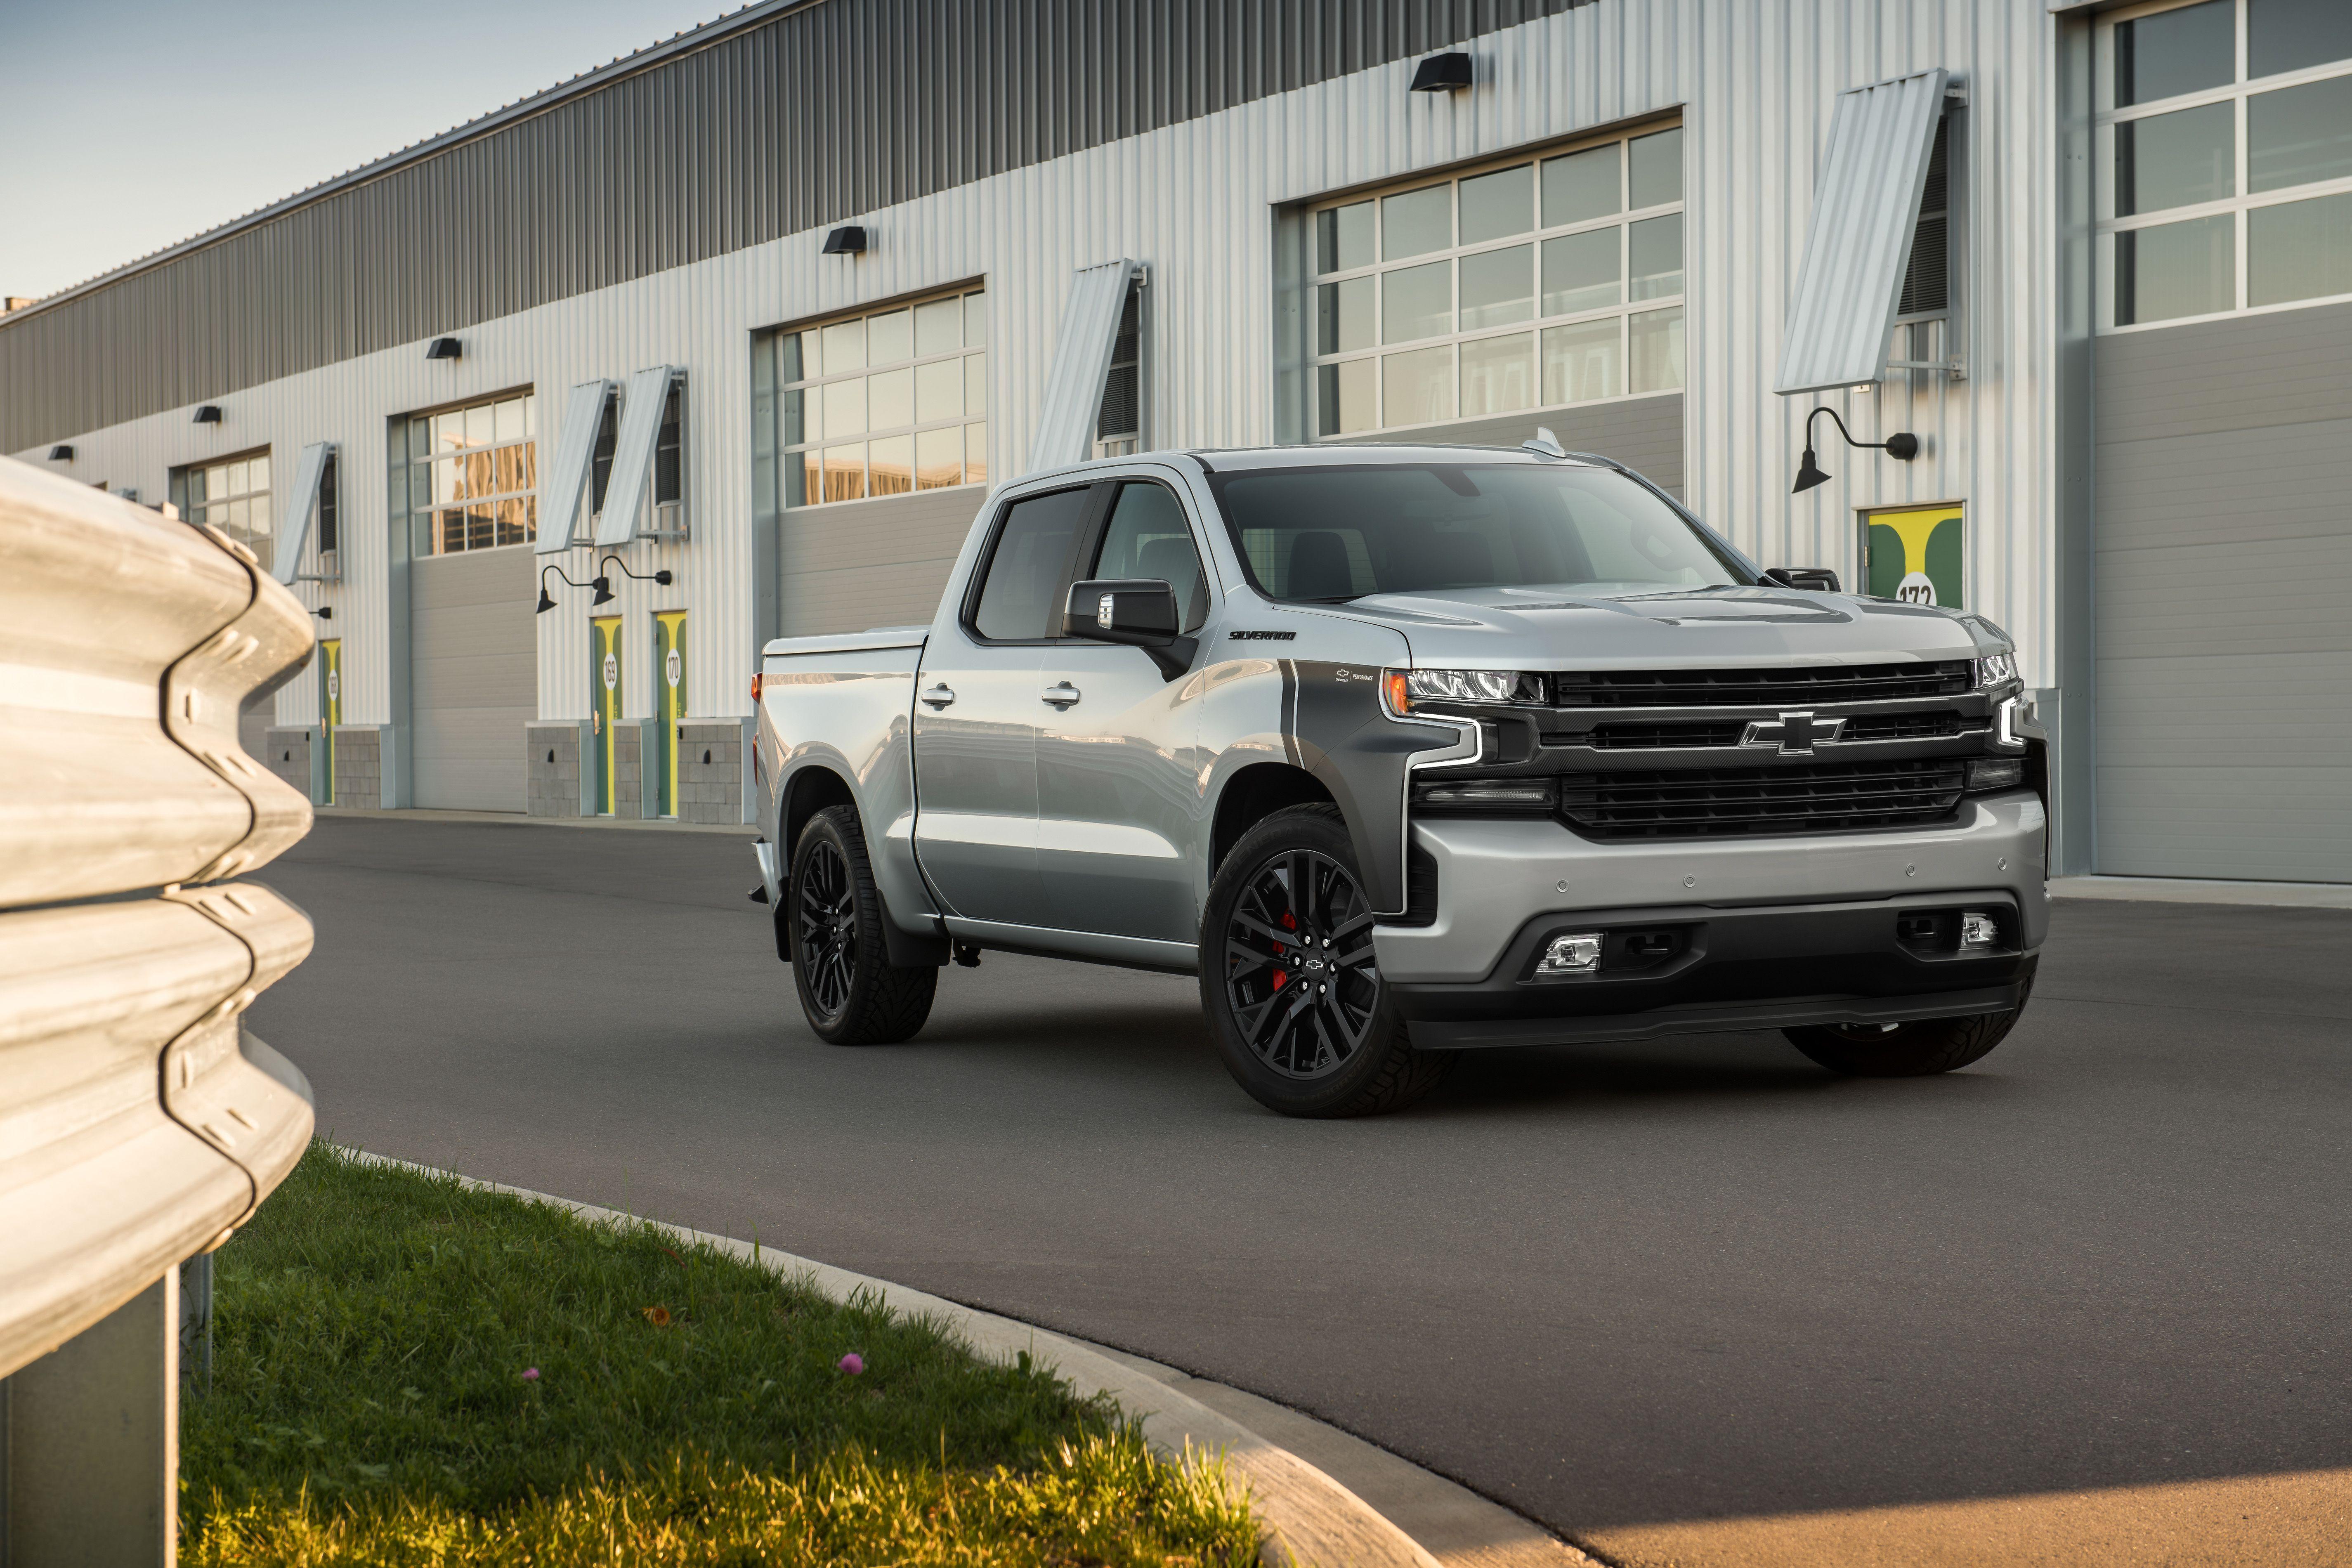 2018 Chevrolet Silverado Rst Street Concept Chevy Trucks